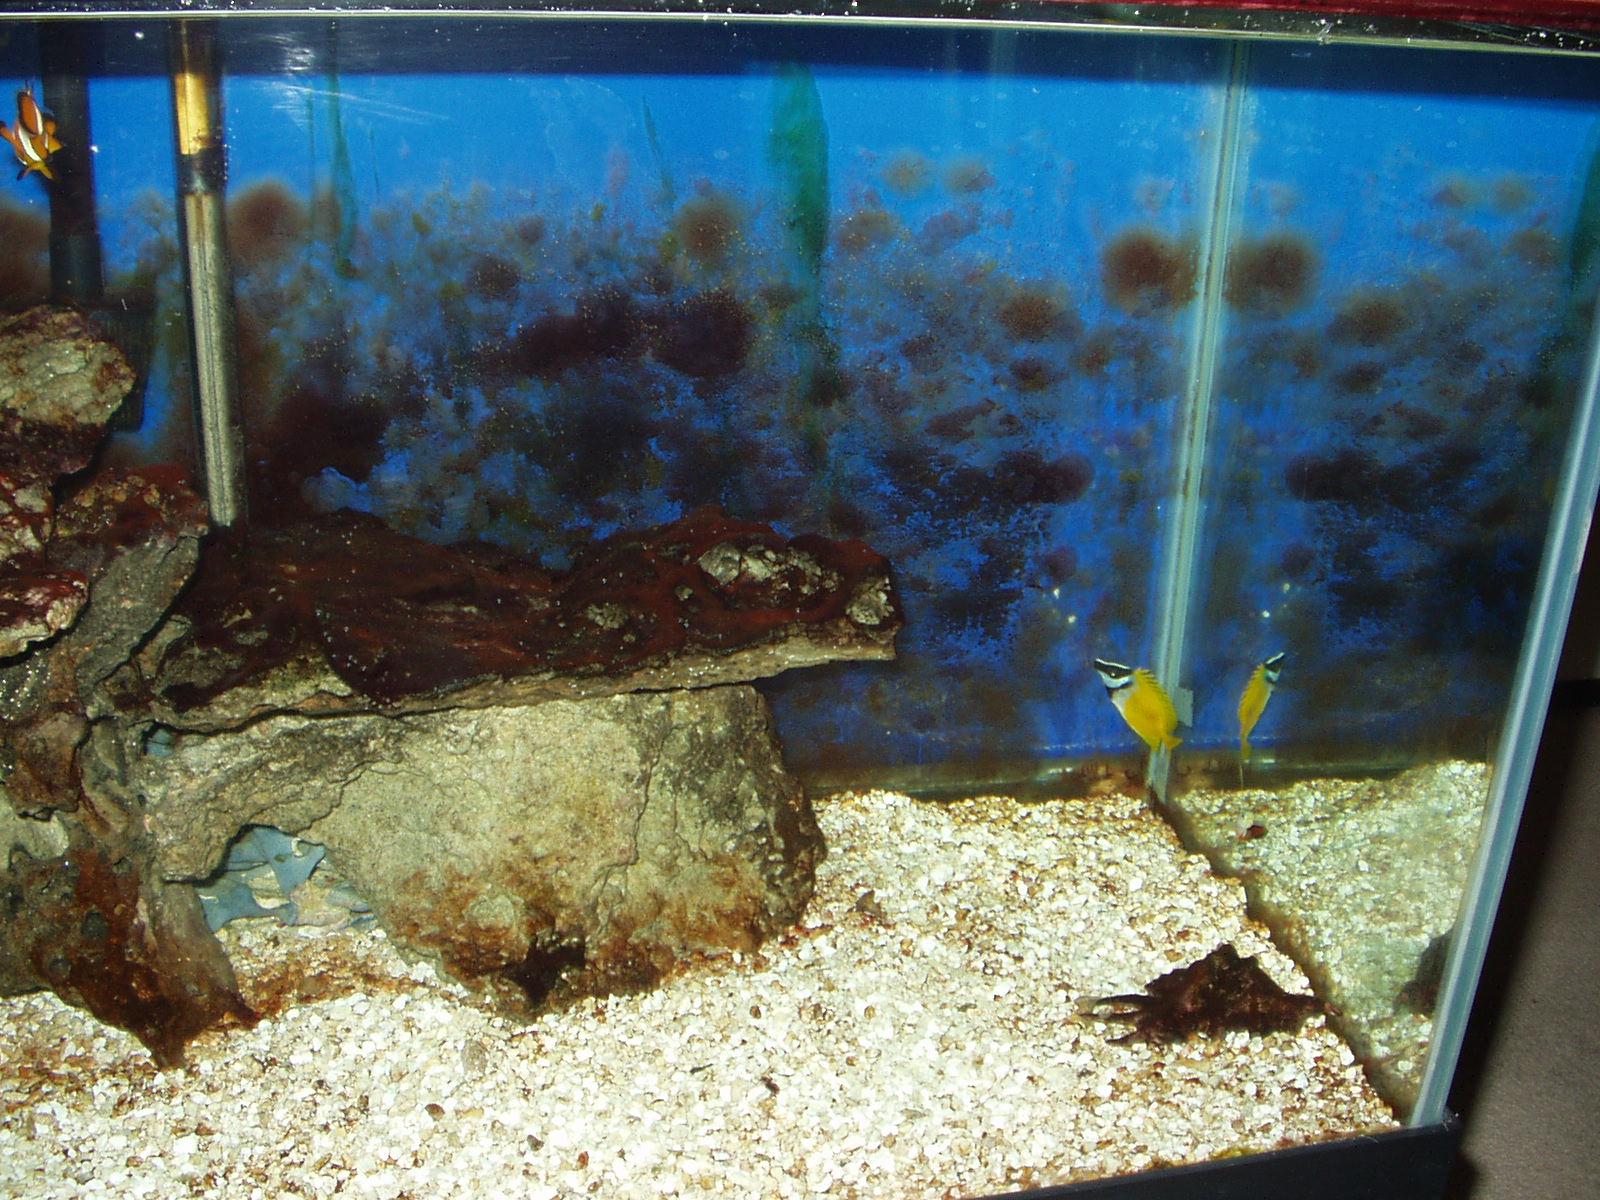 Aquarium algae control how i got rid of nuisance algae in for How to remove algae from fish tank glass